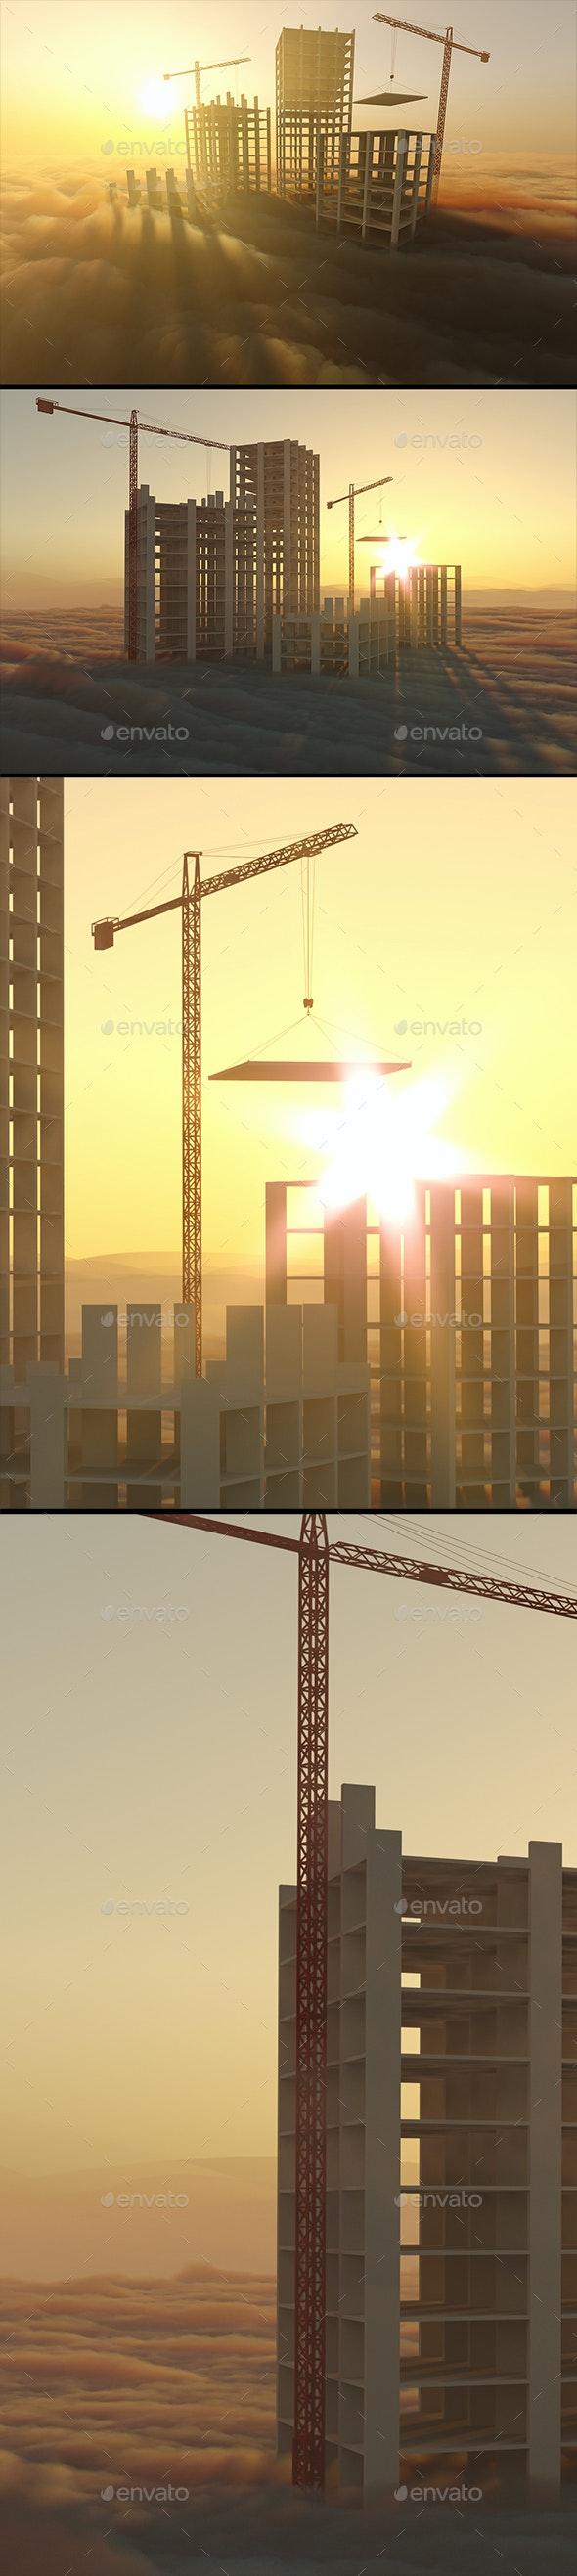 Skyscrapers Under Construction - 3D Backgrounds